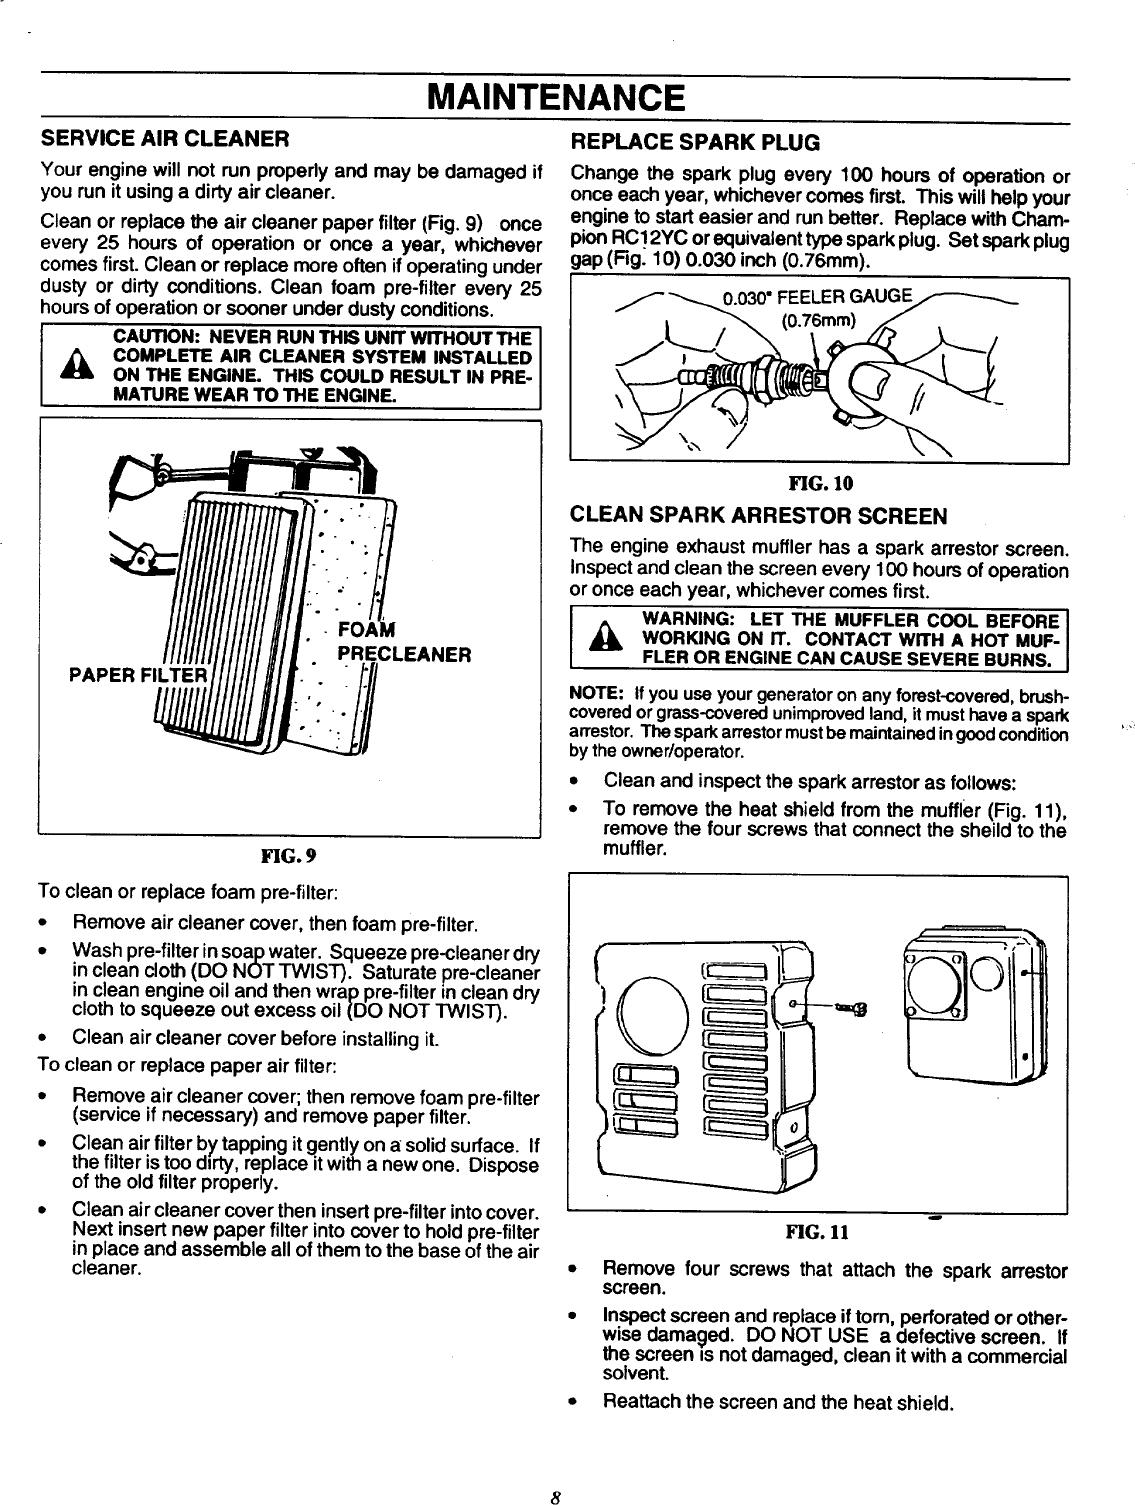 Craftsman 580 32672 Owners Manual ManualsLib Makes It Easy